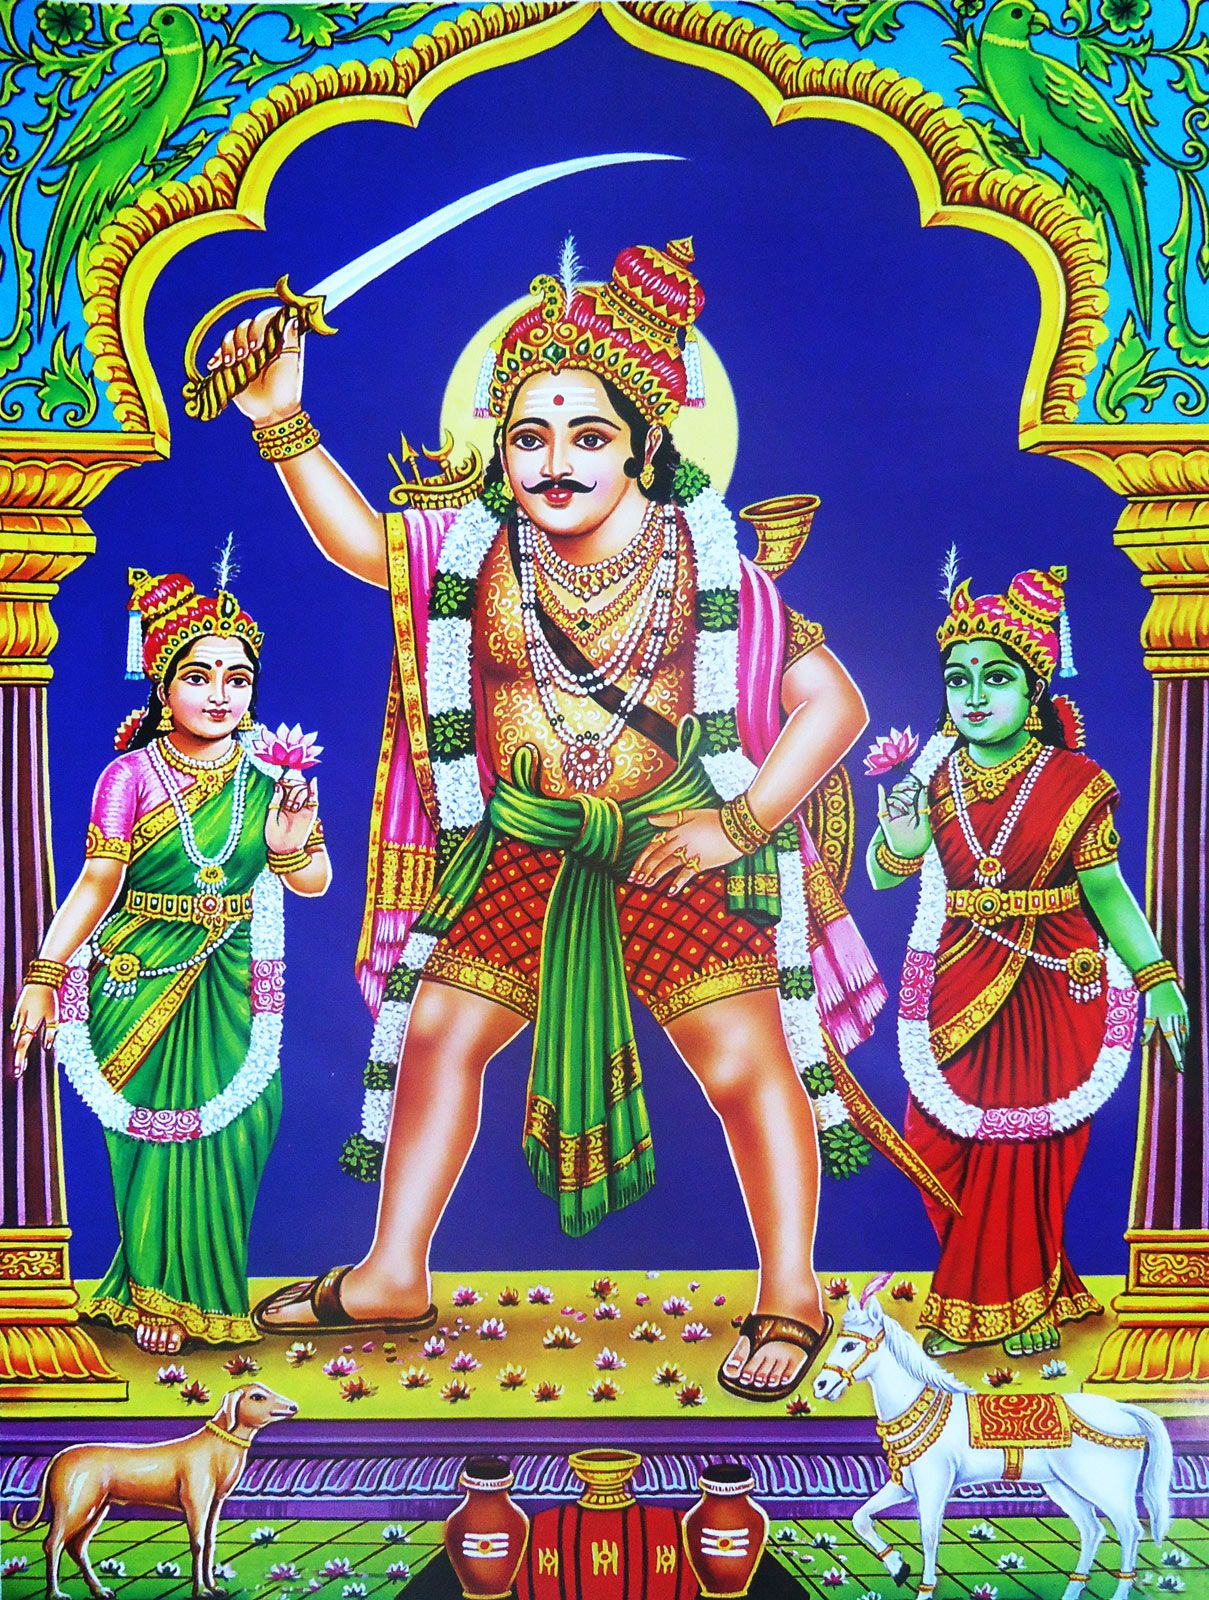 Beautiful Wallpaper Lord Bhadrakali - 7d5946708d4cb02caee1c2ea3e5ff77e  Gallery_9495.jpg